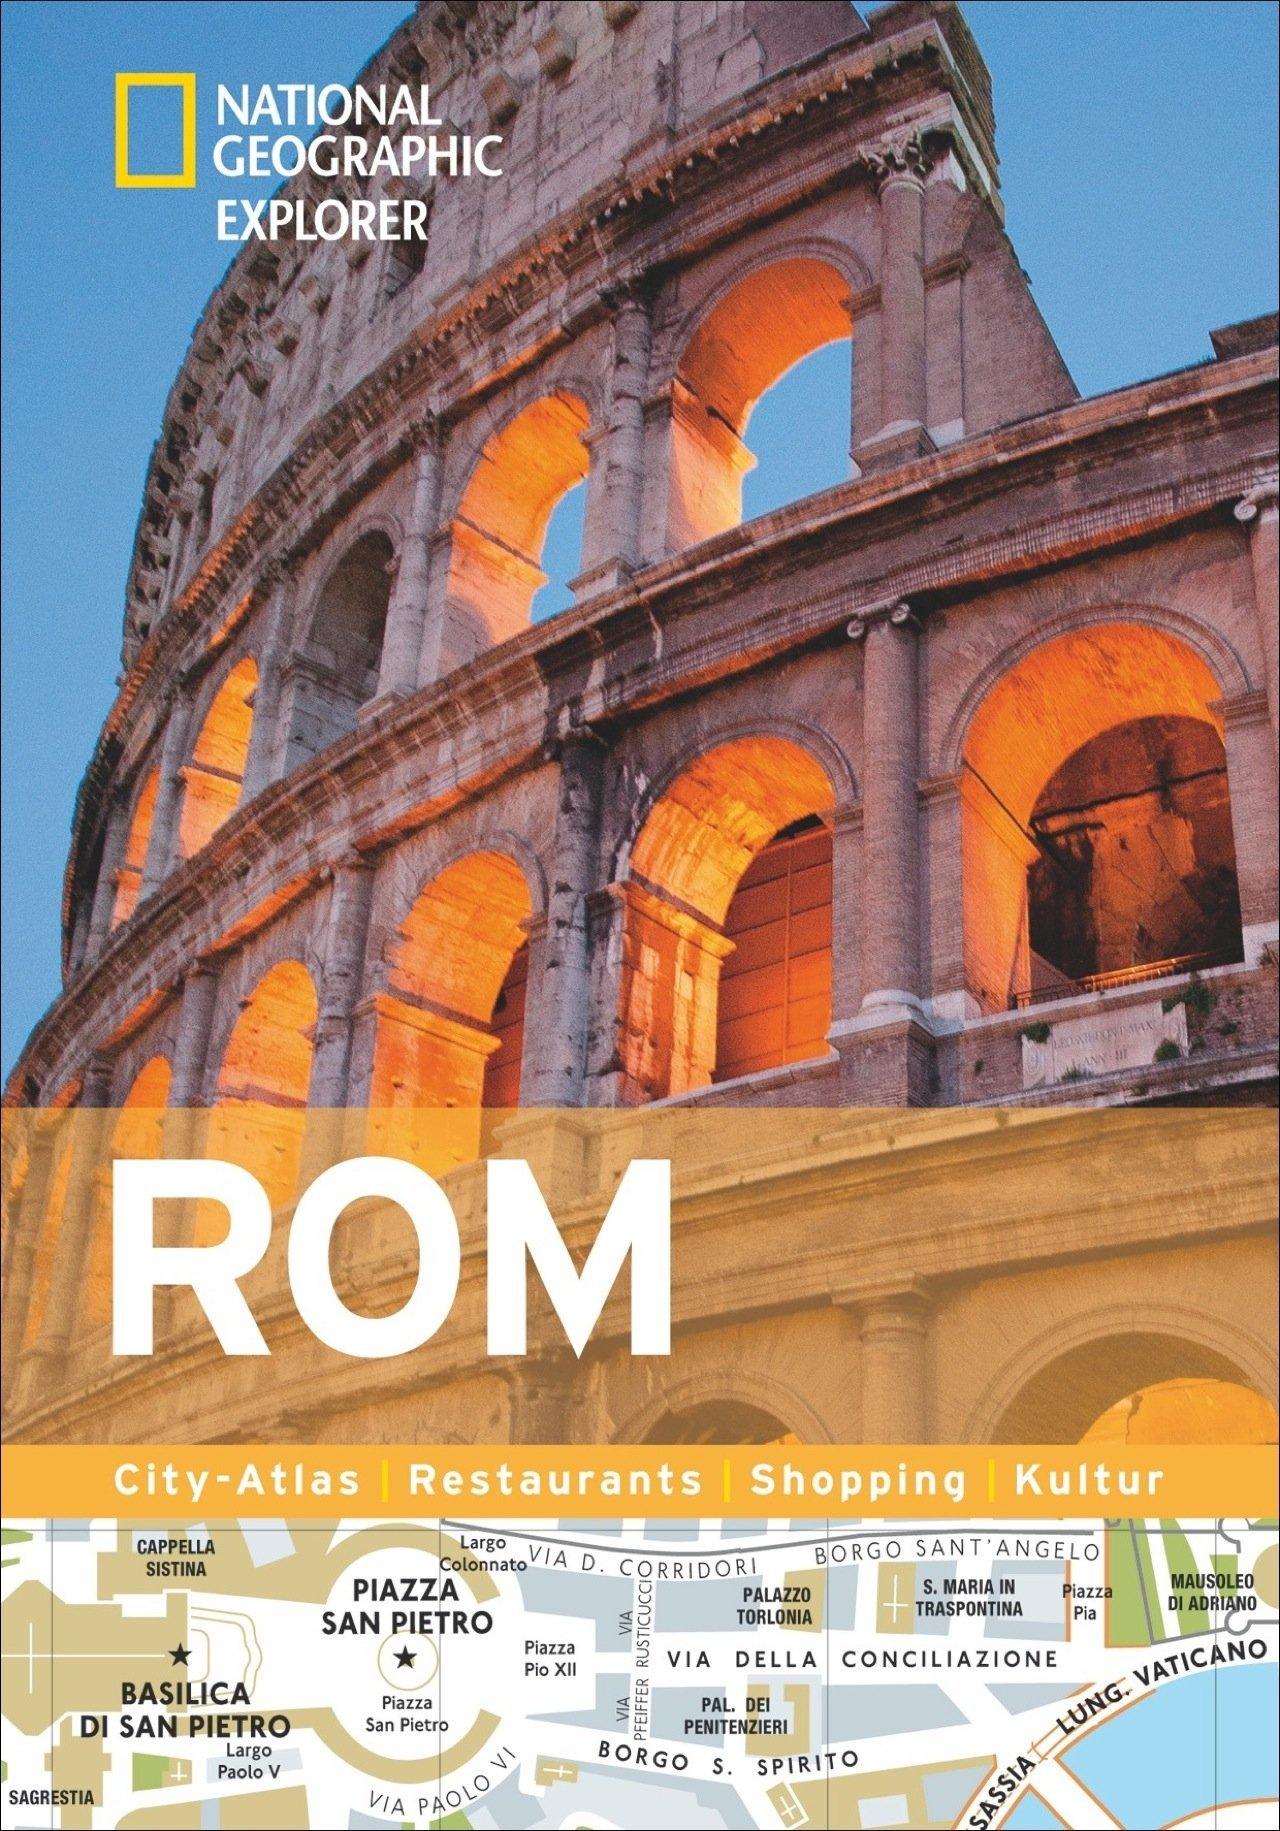 National Geographic Explorer Rom